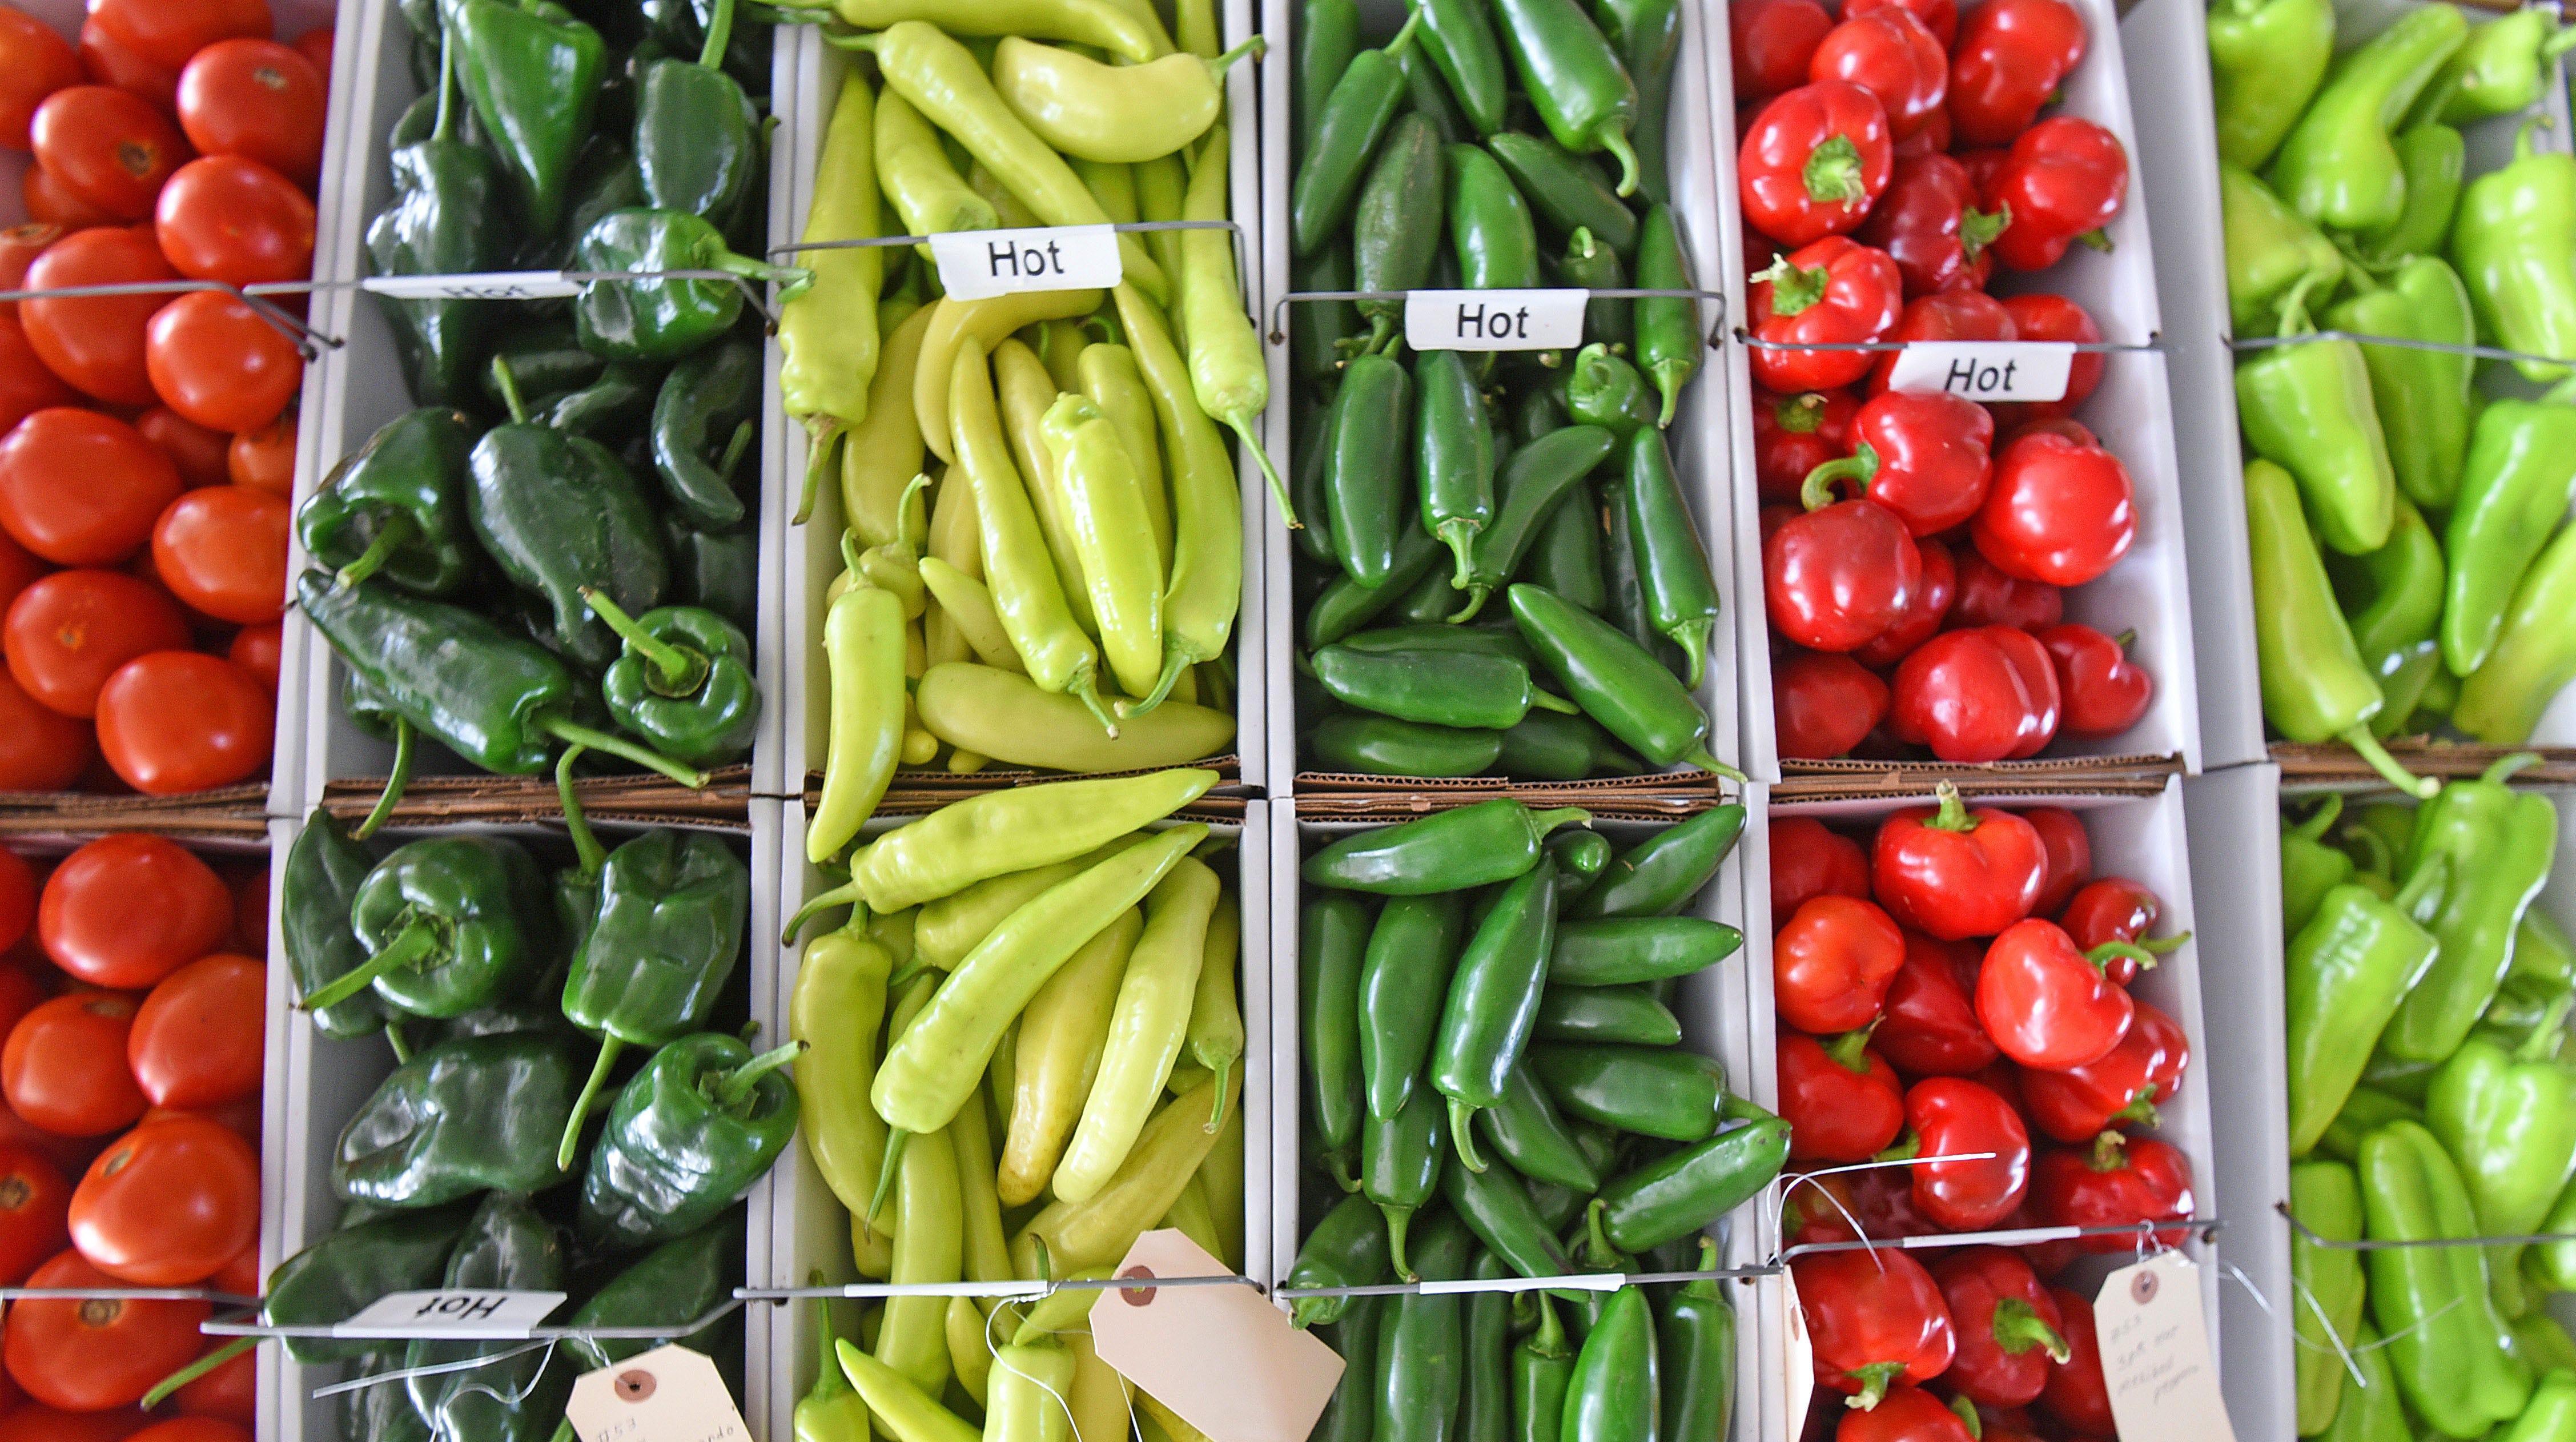 Owl Creek Produce Auction 'a full house of summer produce'